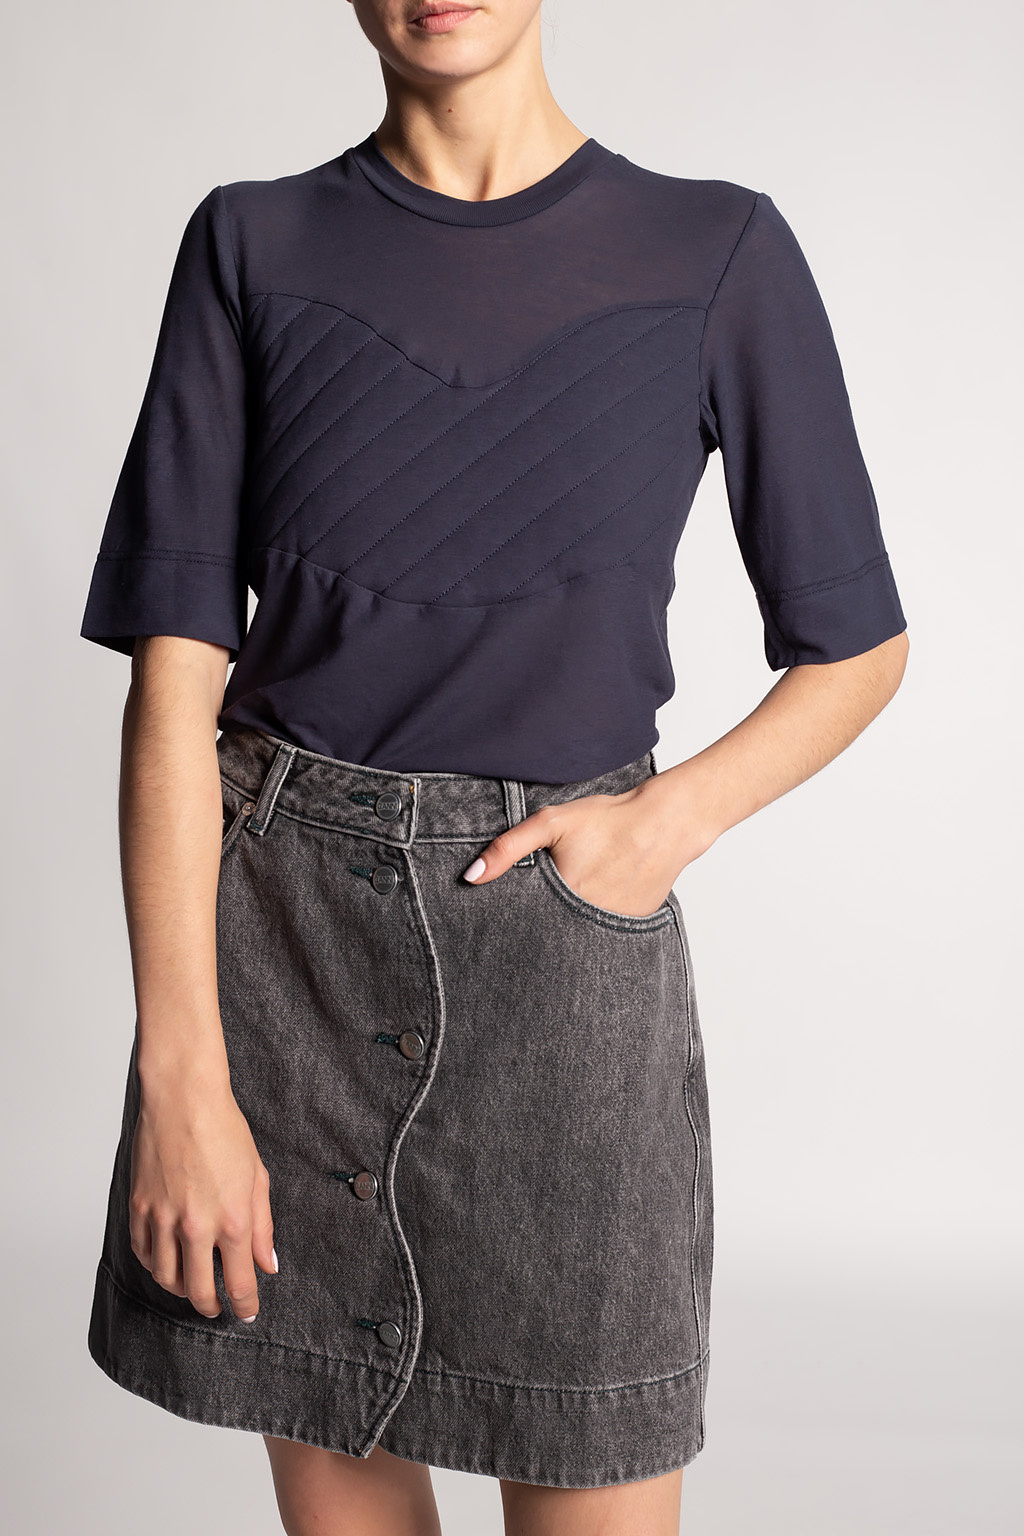 Ganni Organic cotton top